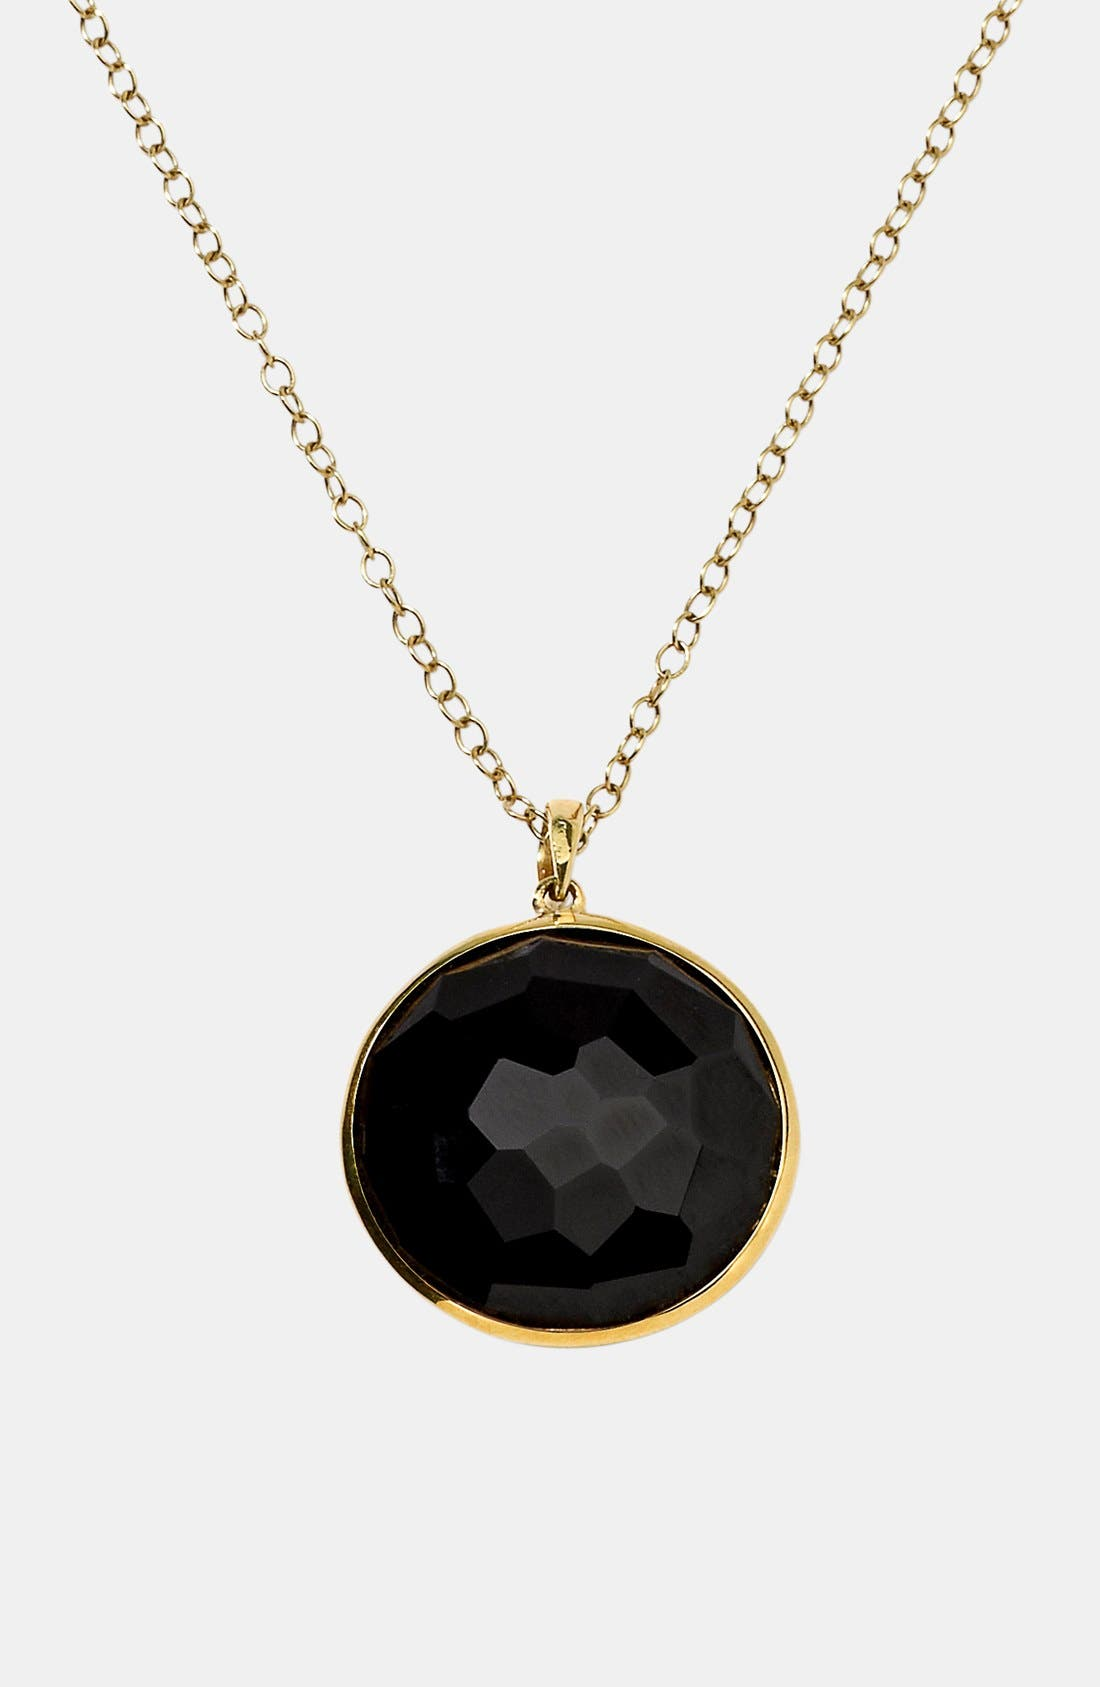 Main Image - Ippolita 'Rock Candy - Lollipop' 18k Gold Pendant Necklace